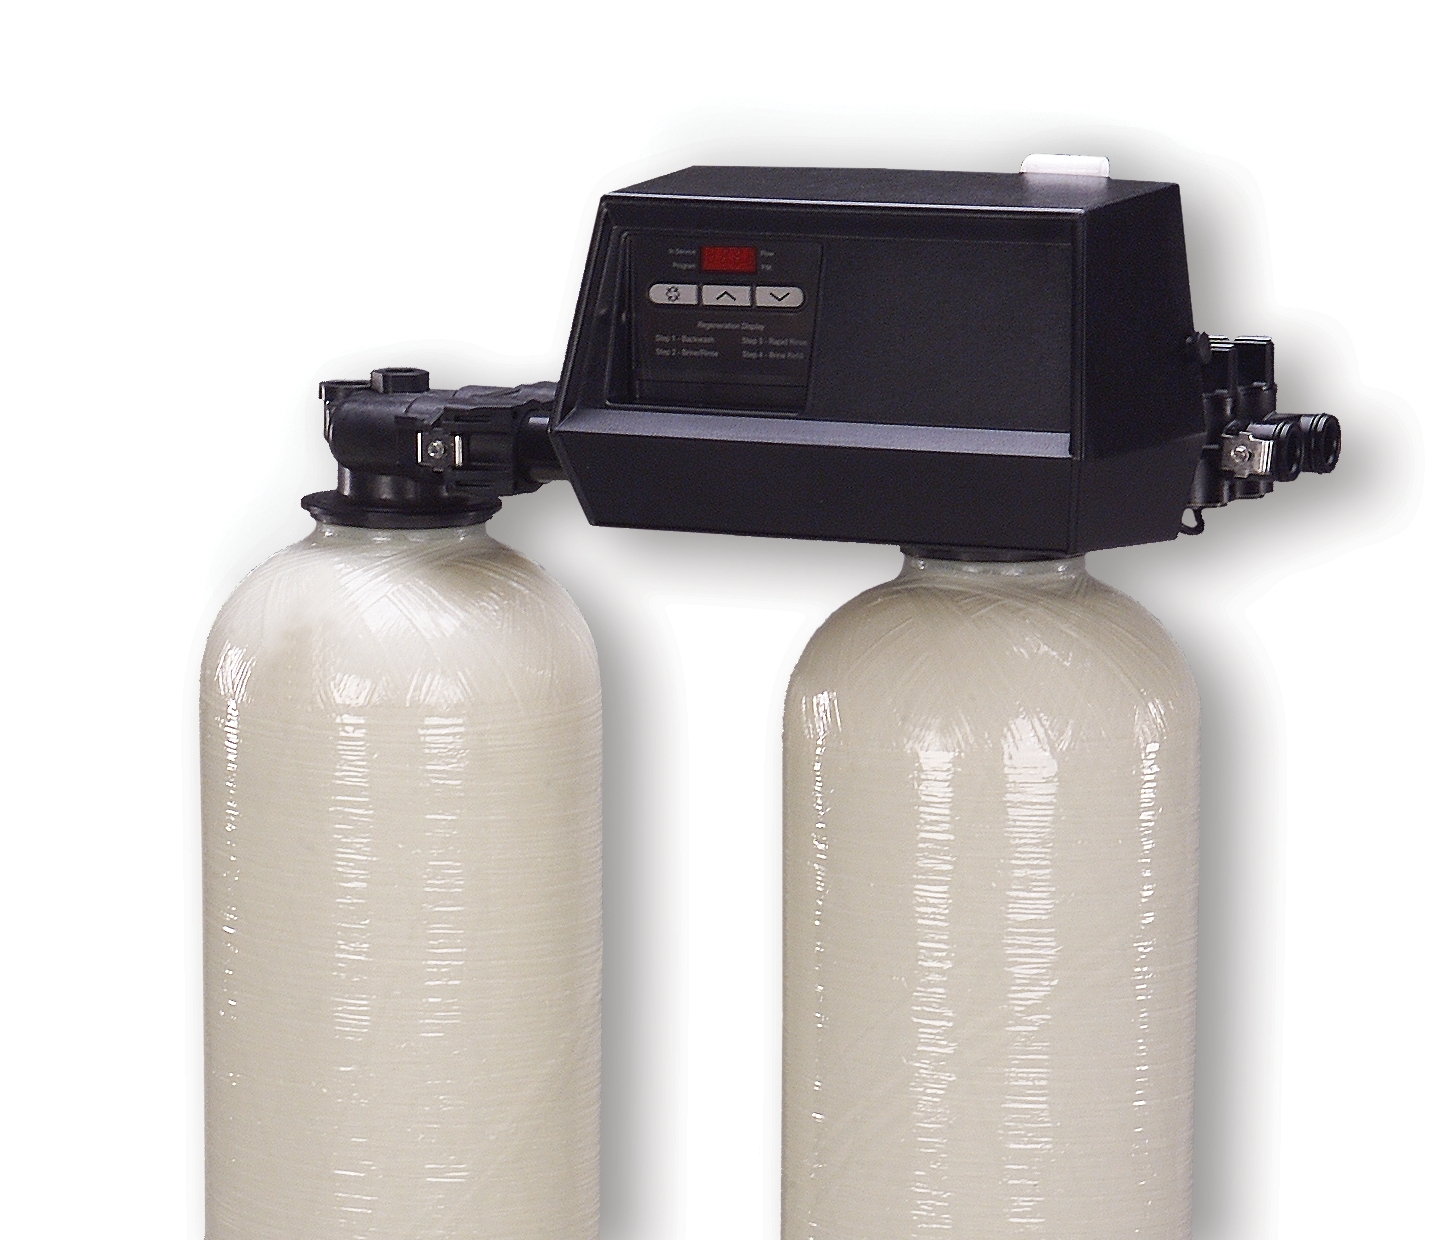 Minkštinimo filtras DVM 08-16 duplex